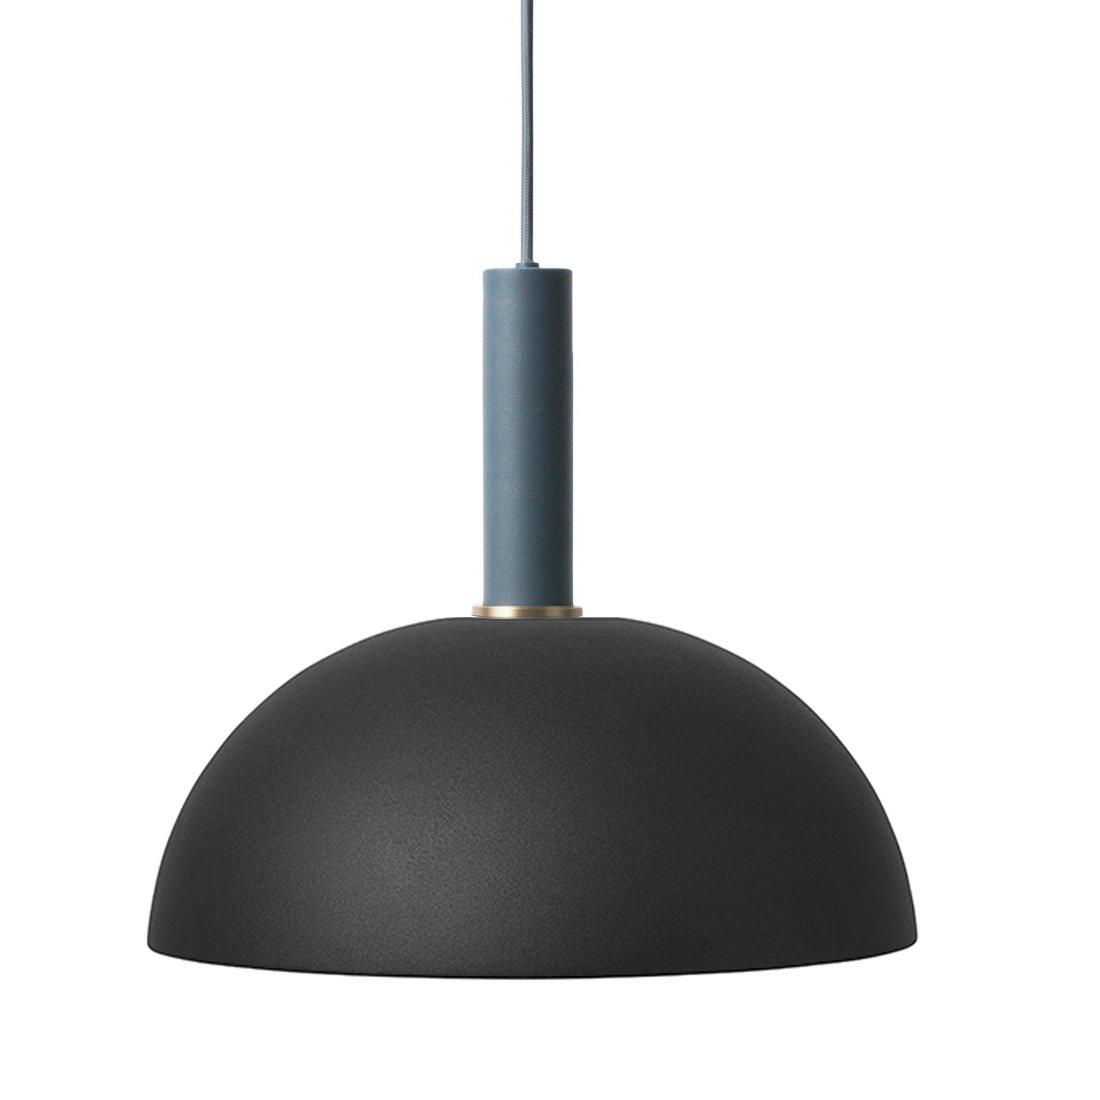 Ferm Living Collect Dome High Hanglamp Donkerblauw Zwart